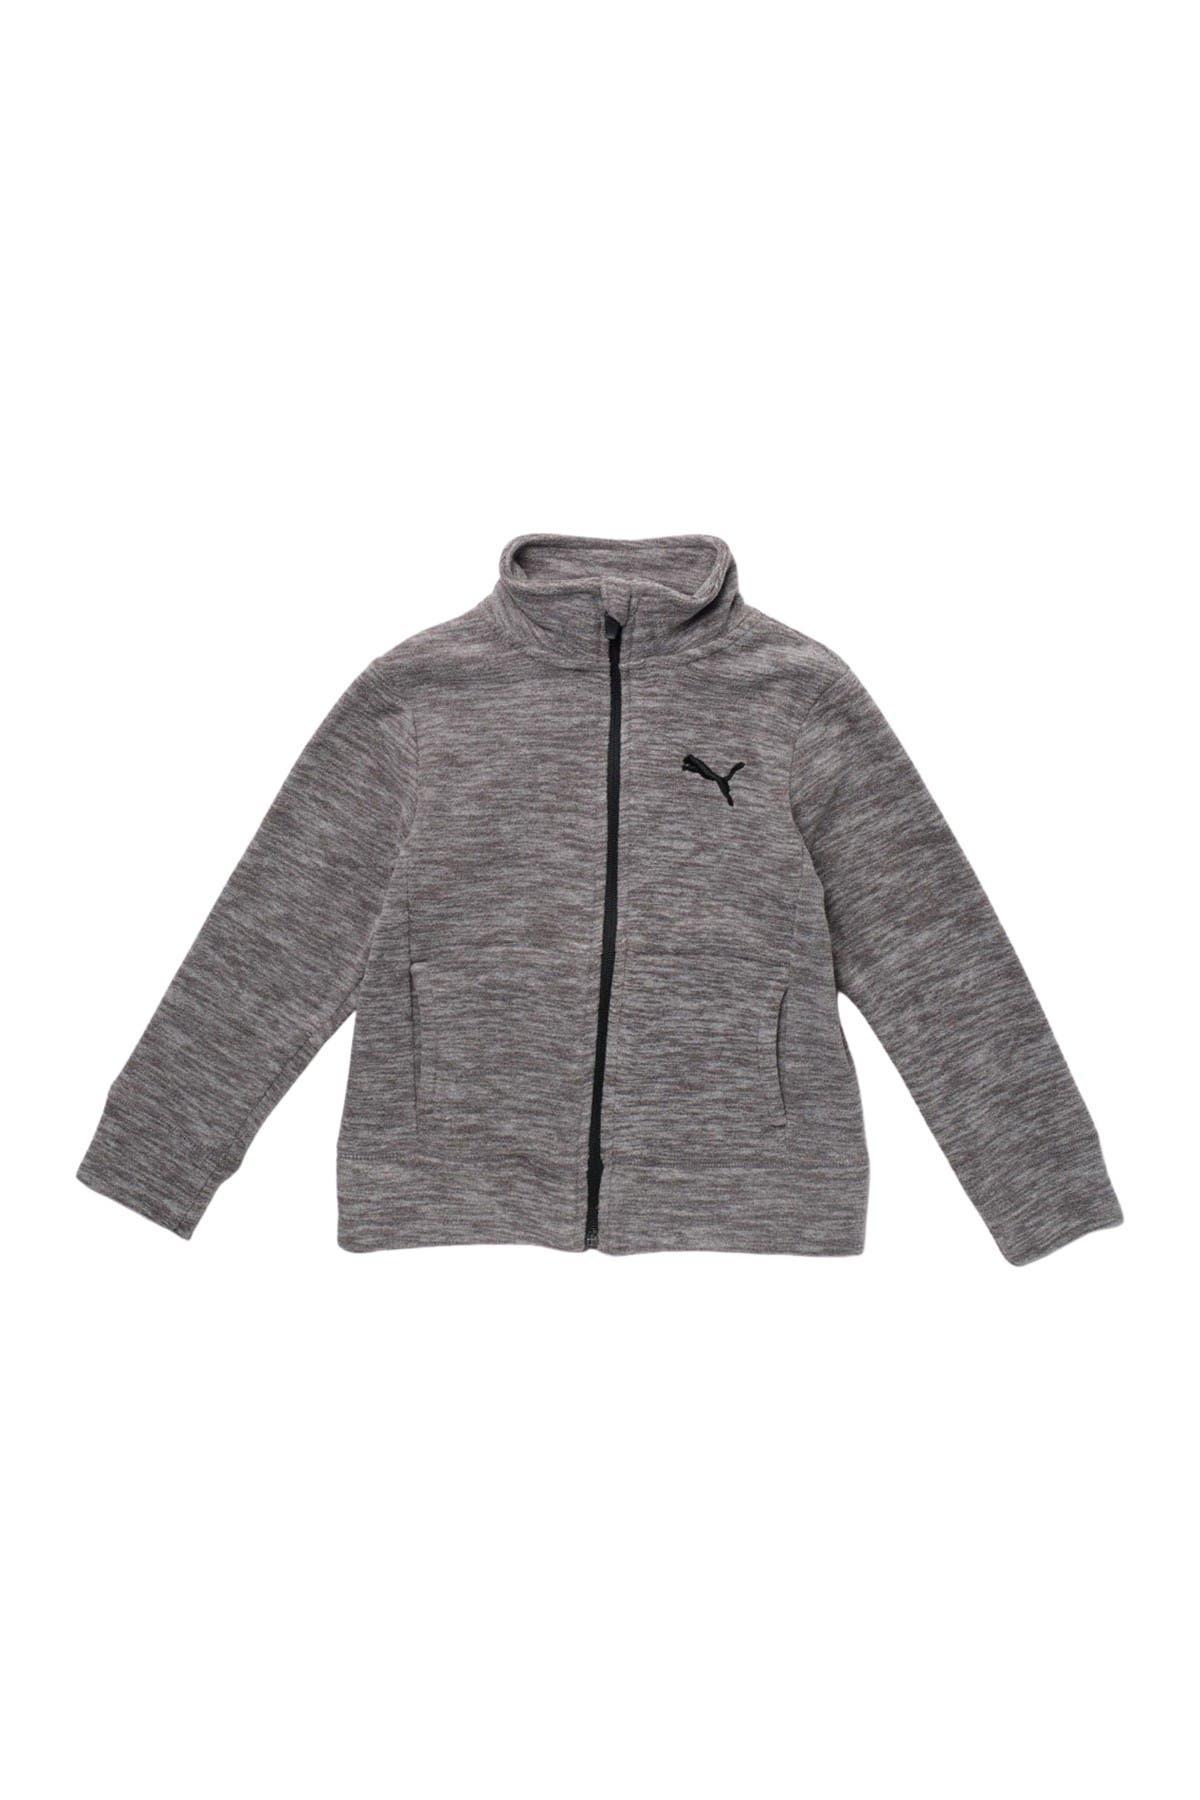 Image of PUMA Polar Fleece Space Dyed Zip Up Sweater